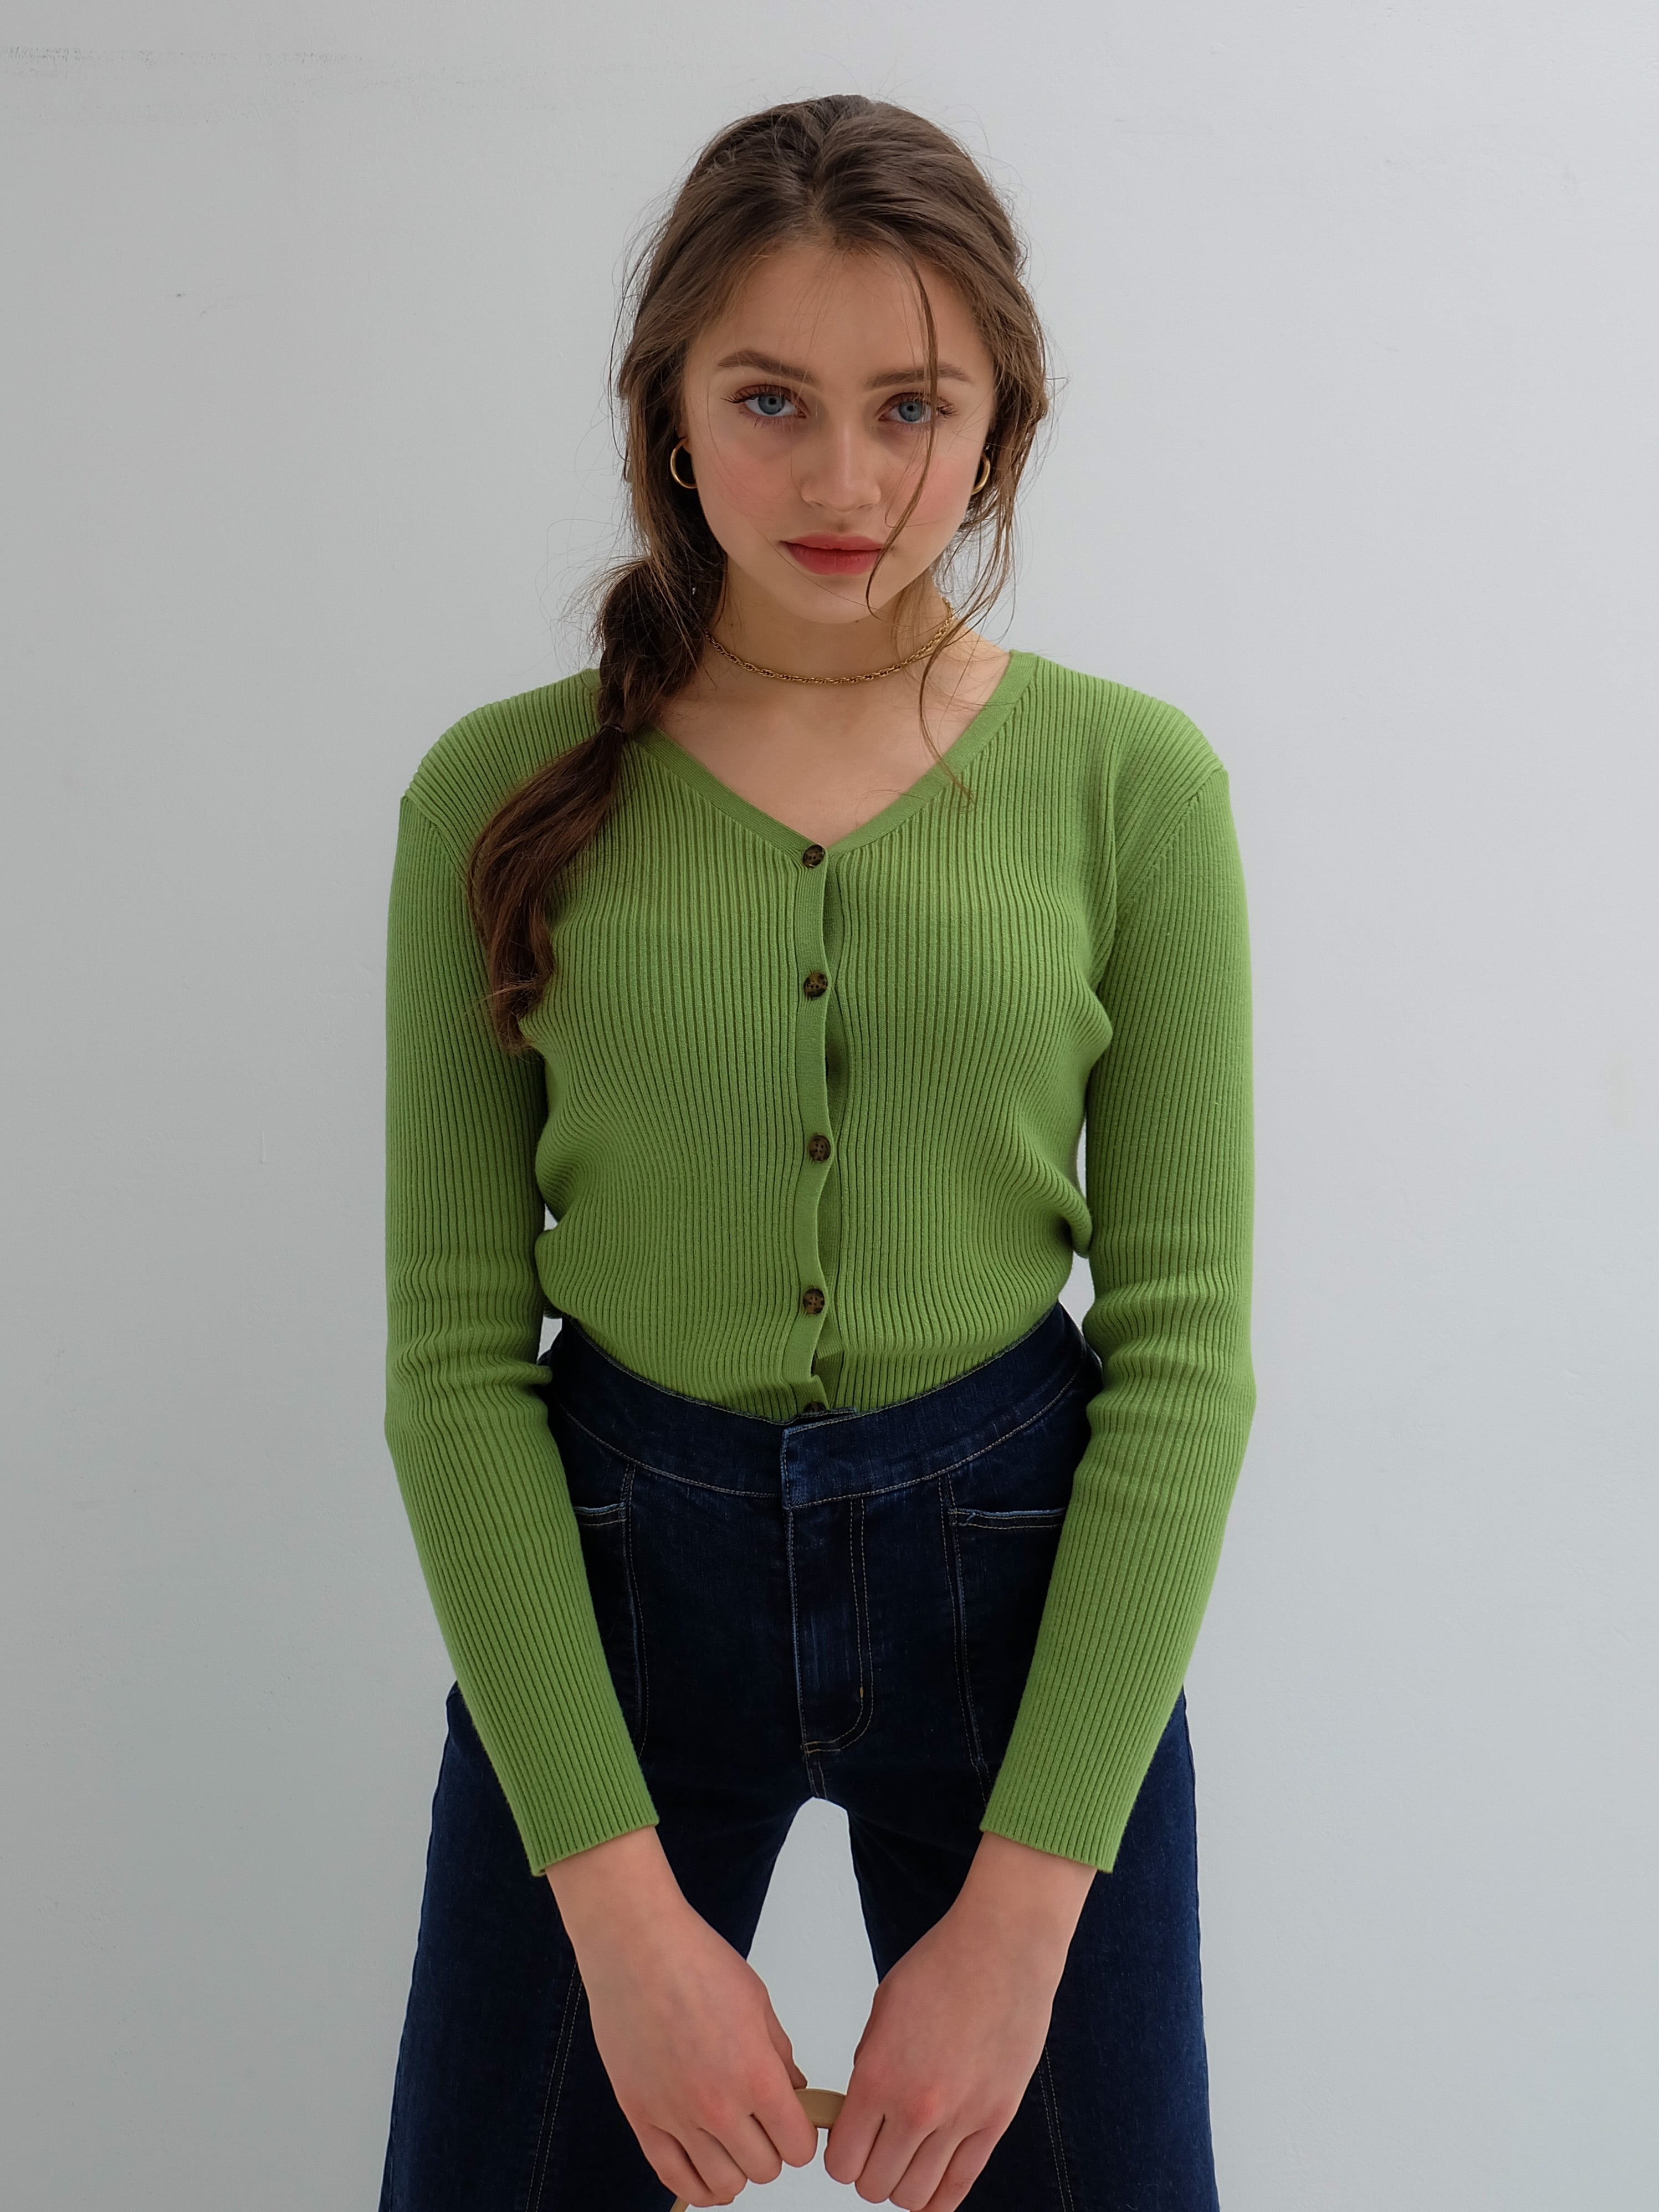 2way rib knit(yellow green)